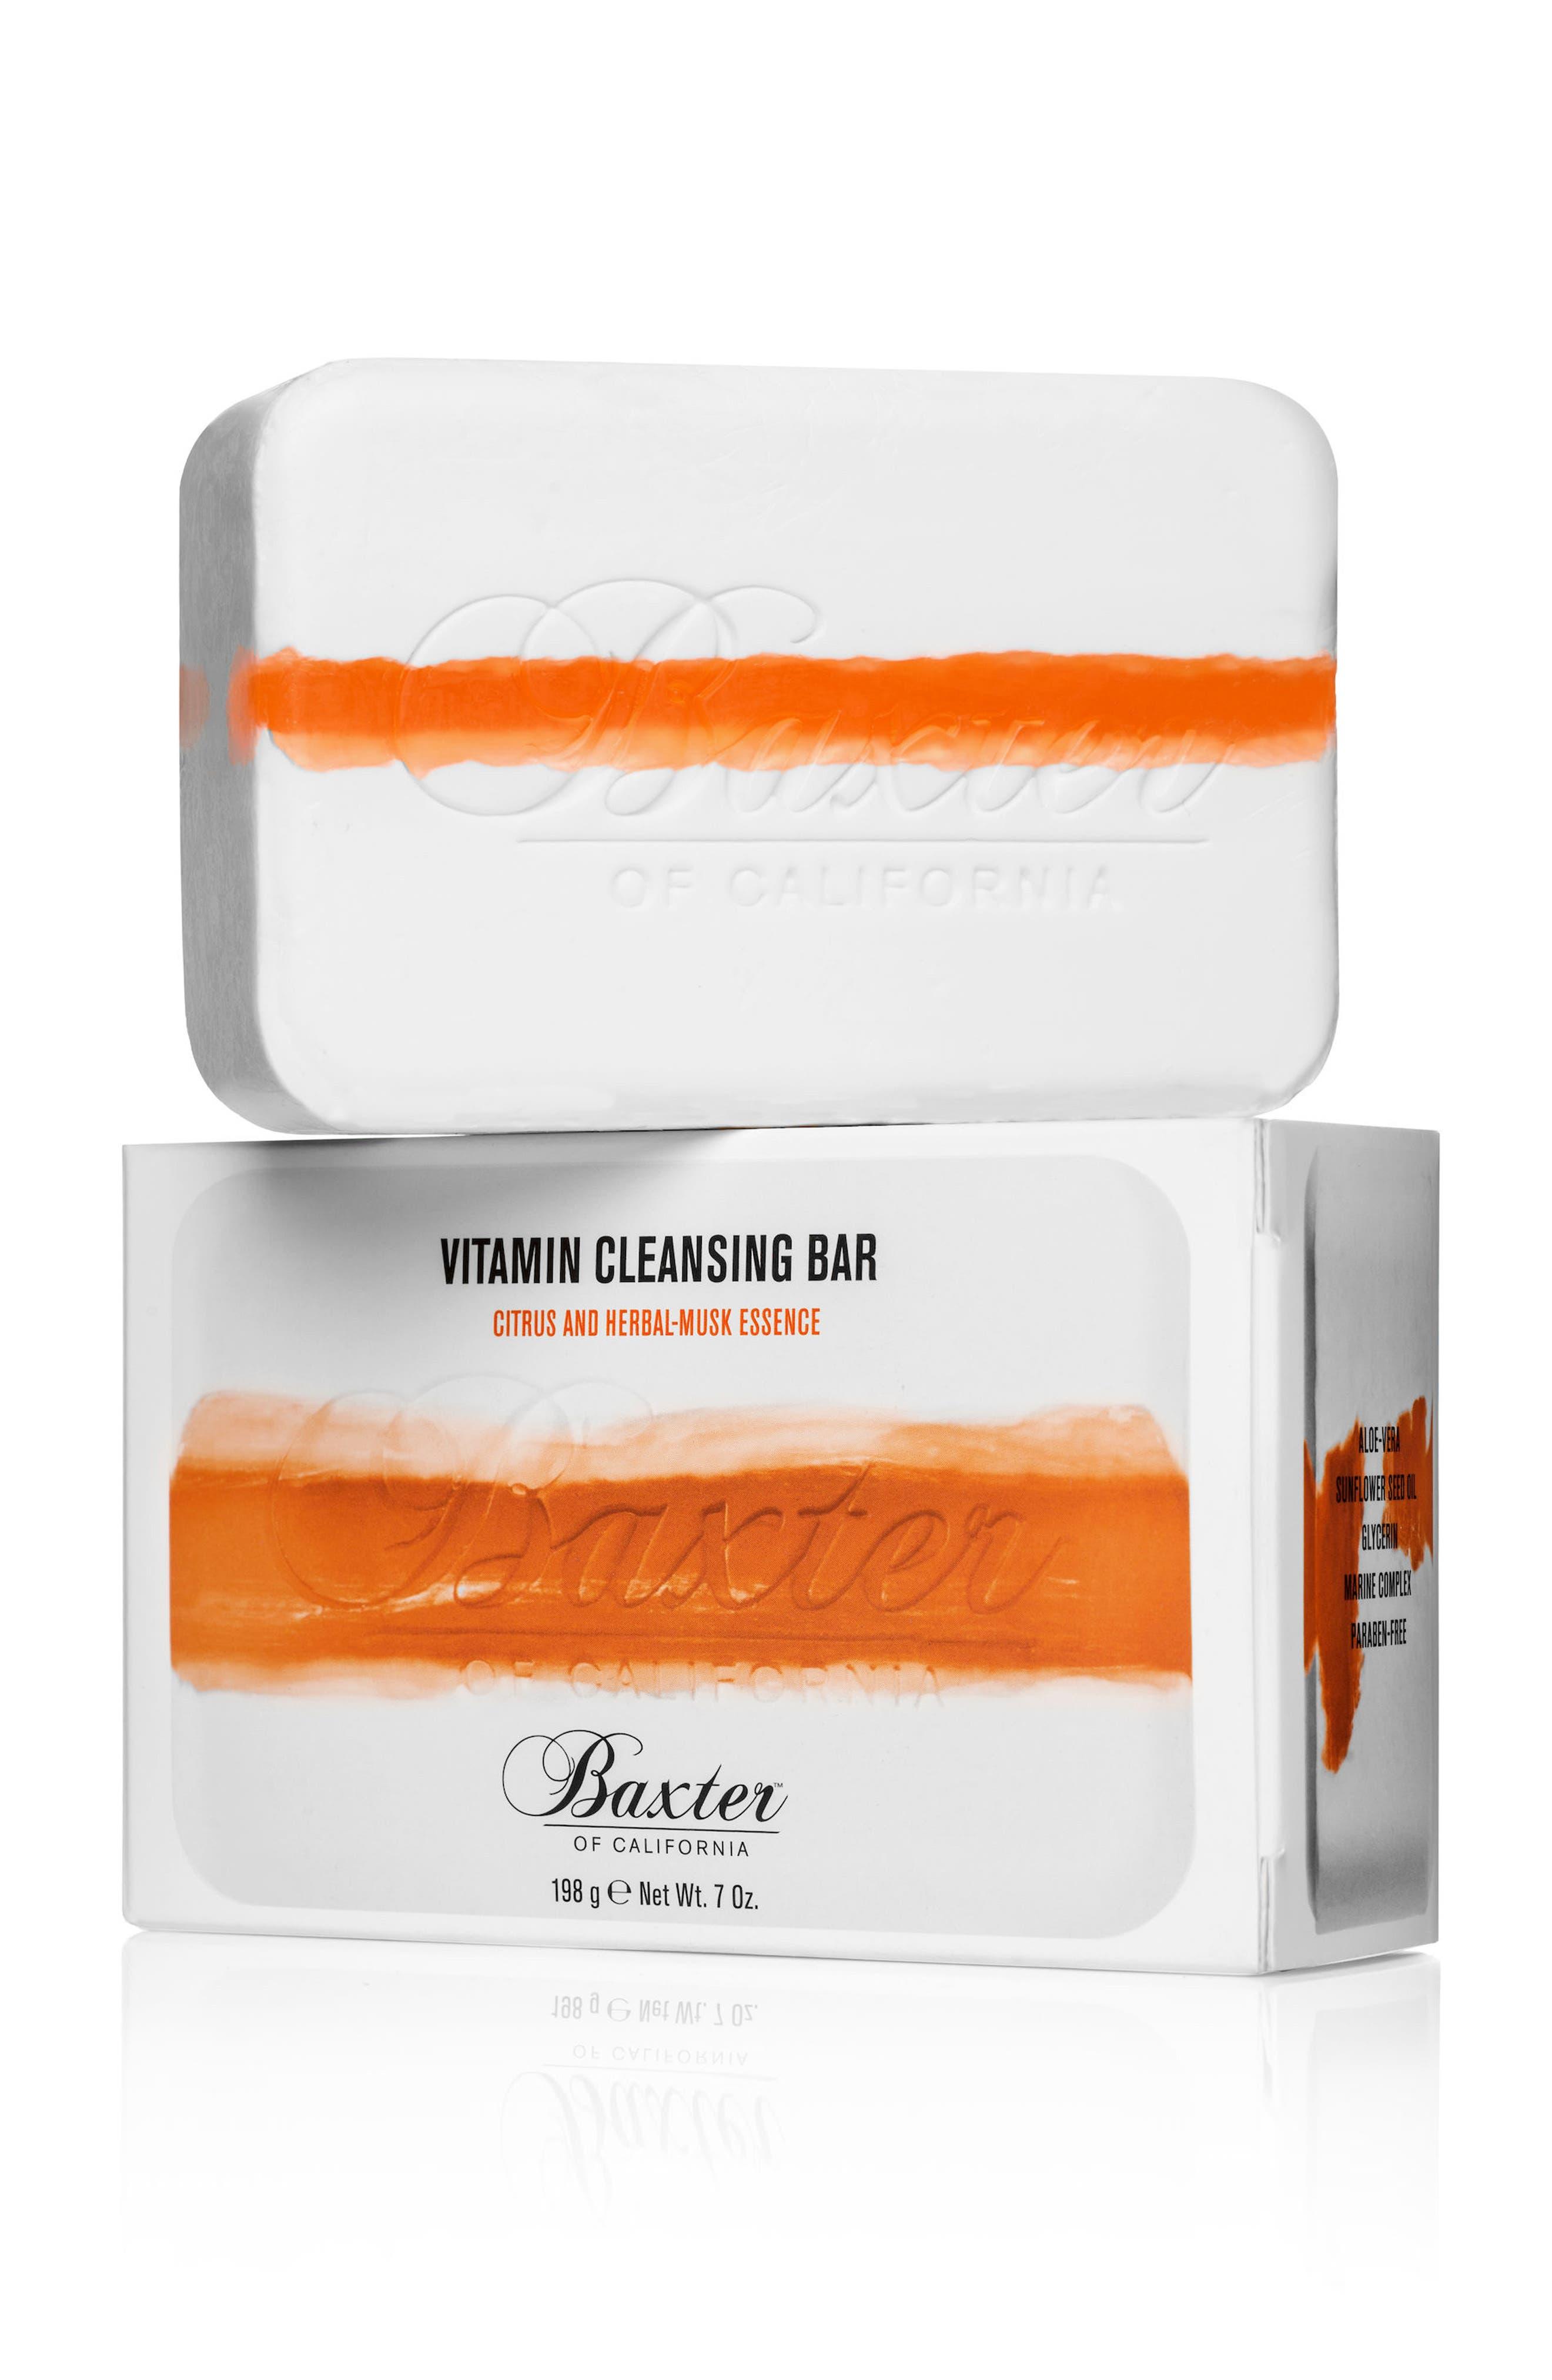 Alternate Image 1 Selected - Baxter of California Vitamin Cleansing Bar